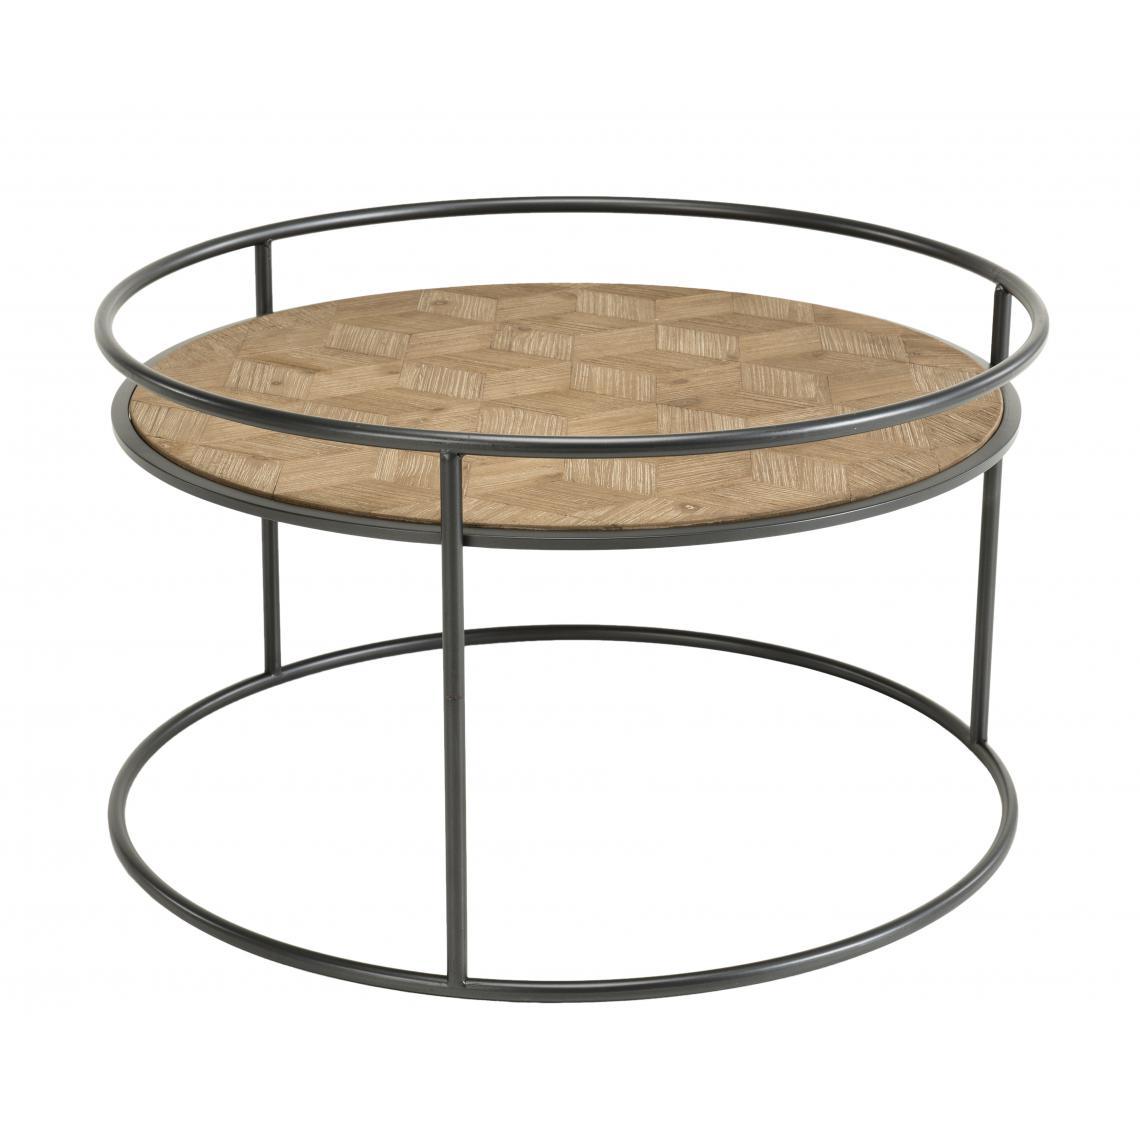 Table basse ronde Sapin et métal - ZELYA 2wqIC